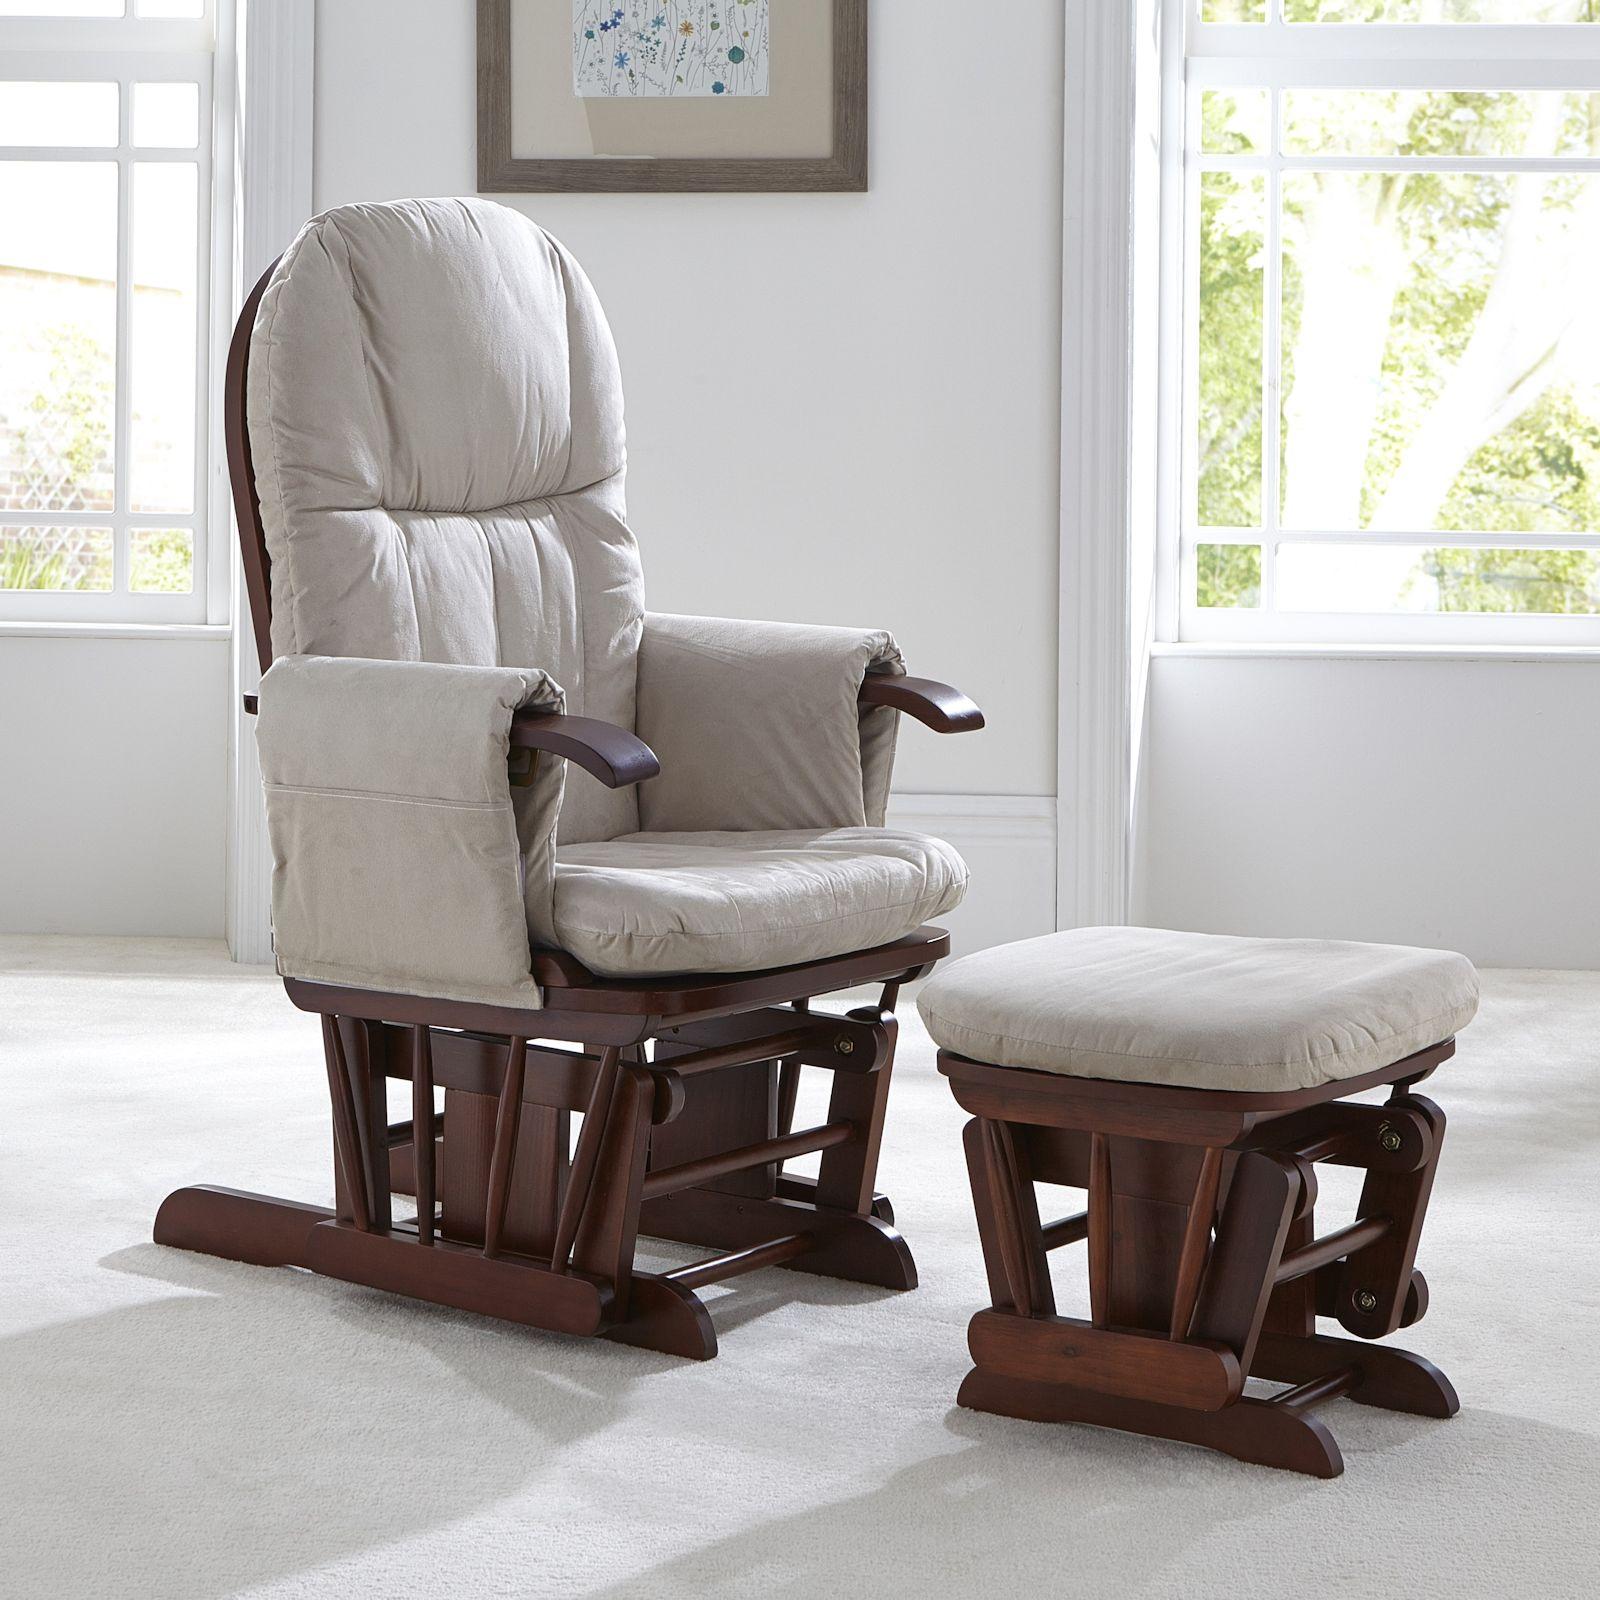 Tutti Bambini GC35 Reclining Glider Nursing Chair & Stool Walnut